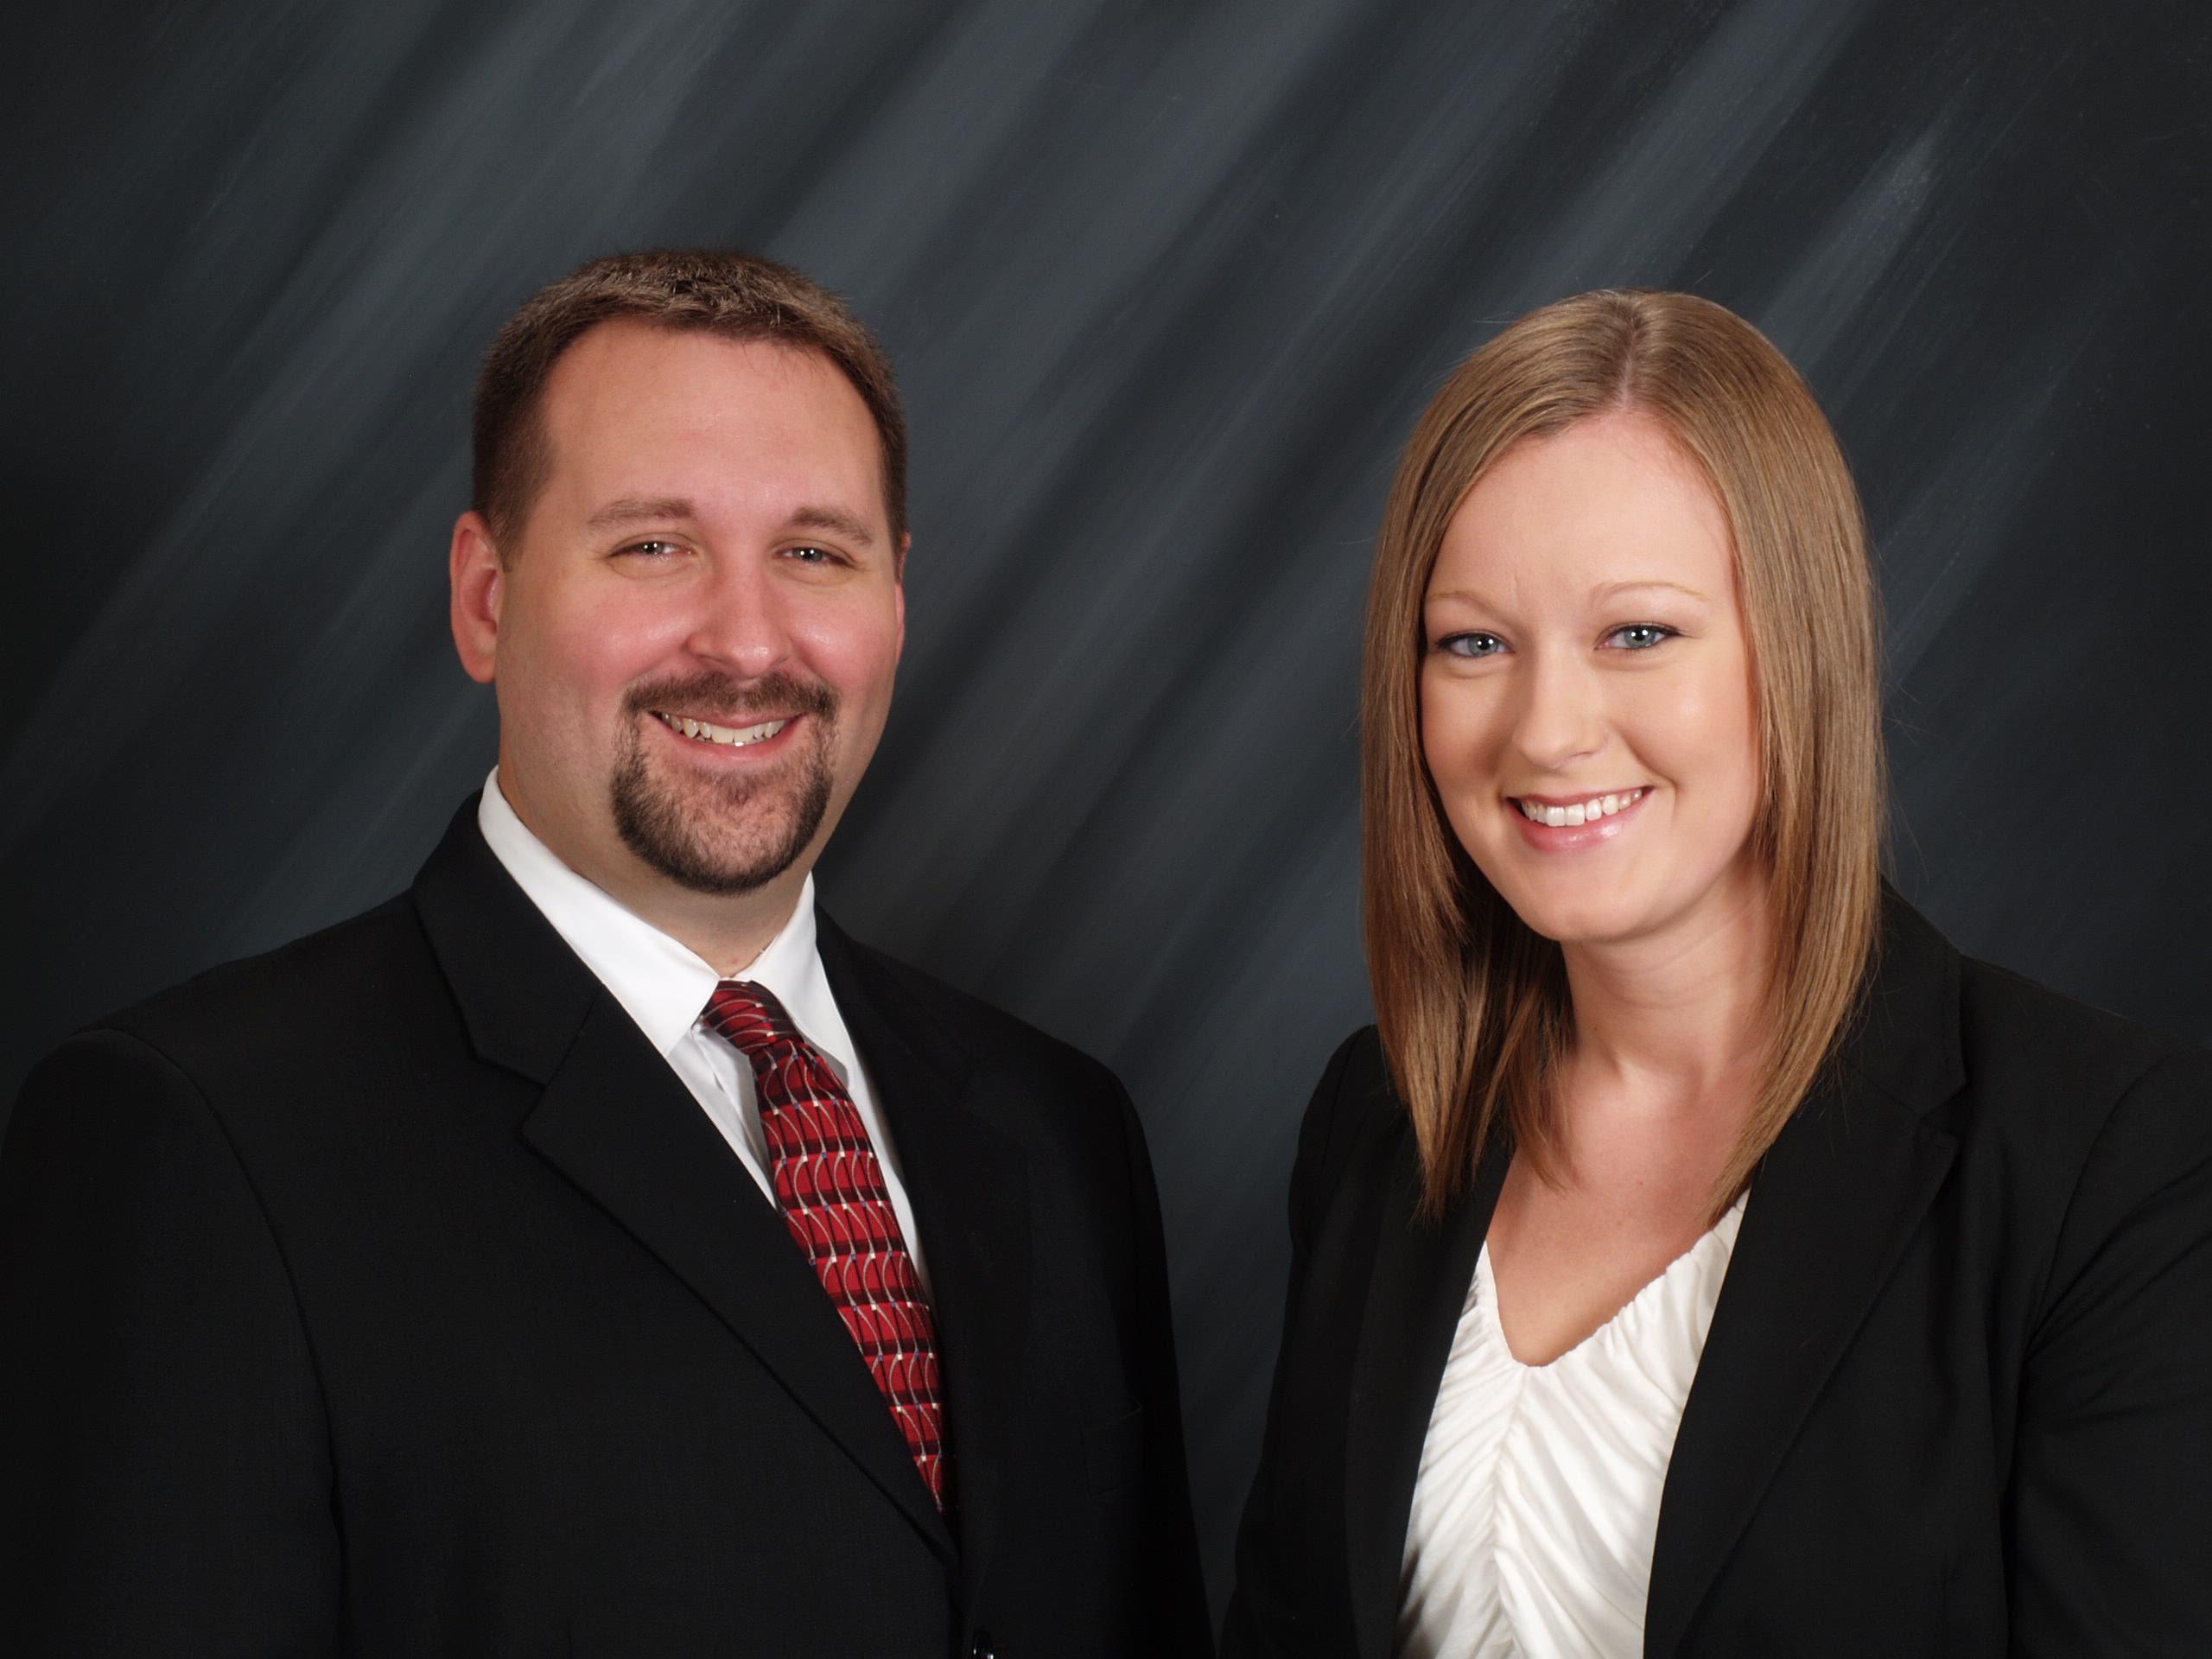 Jackson & Oglesby Law LLC